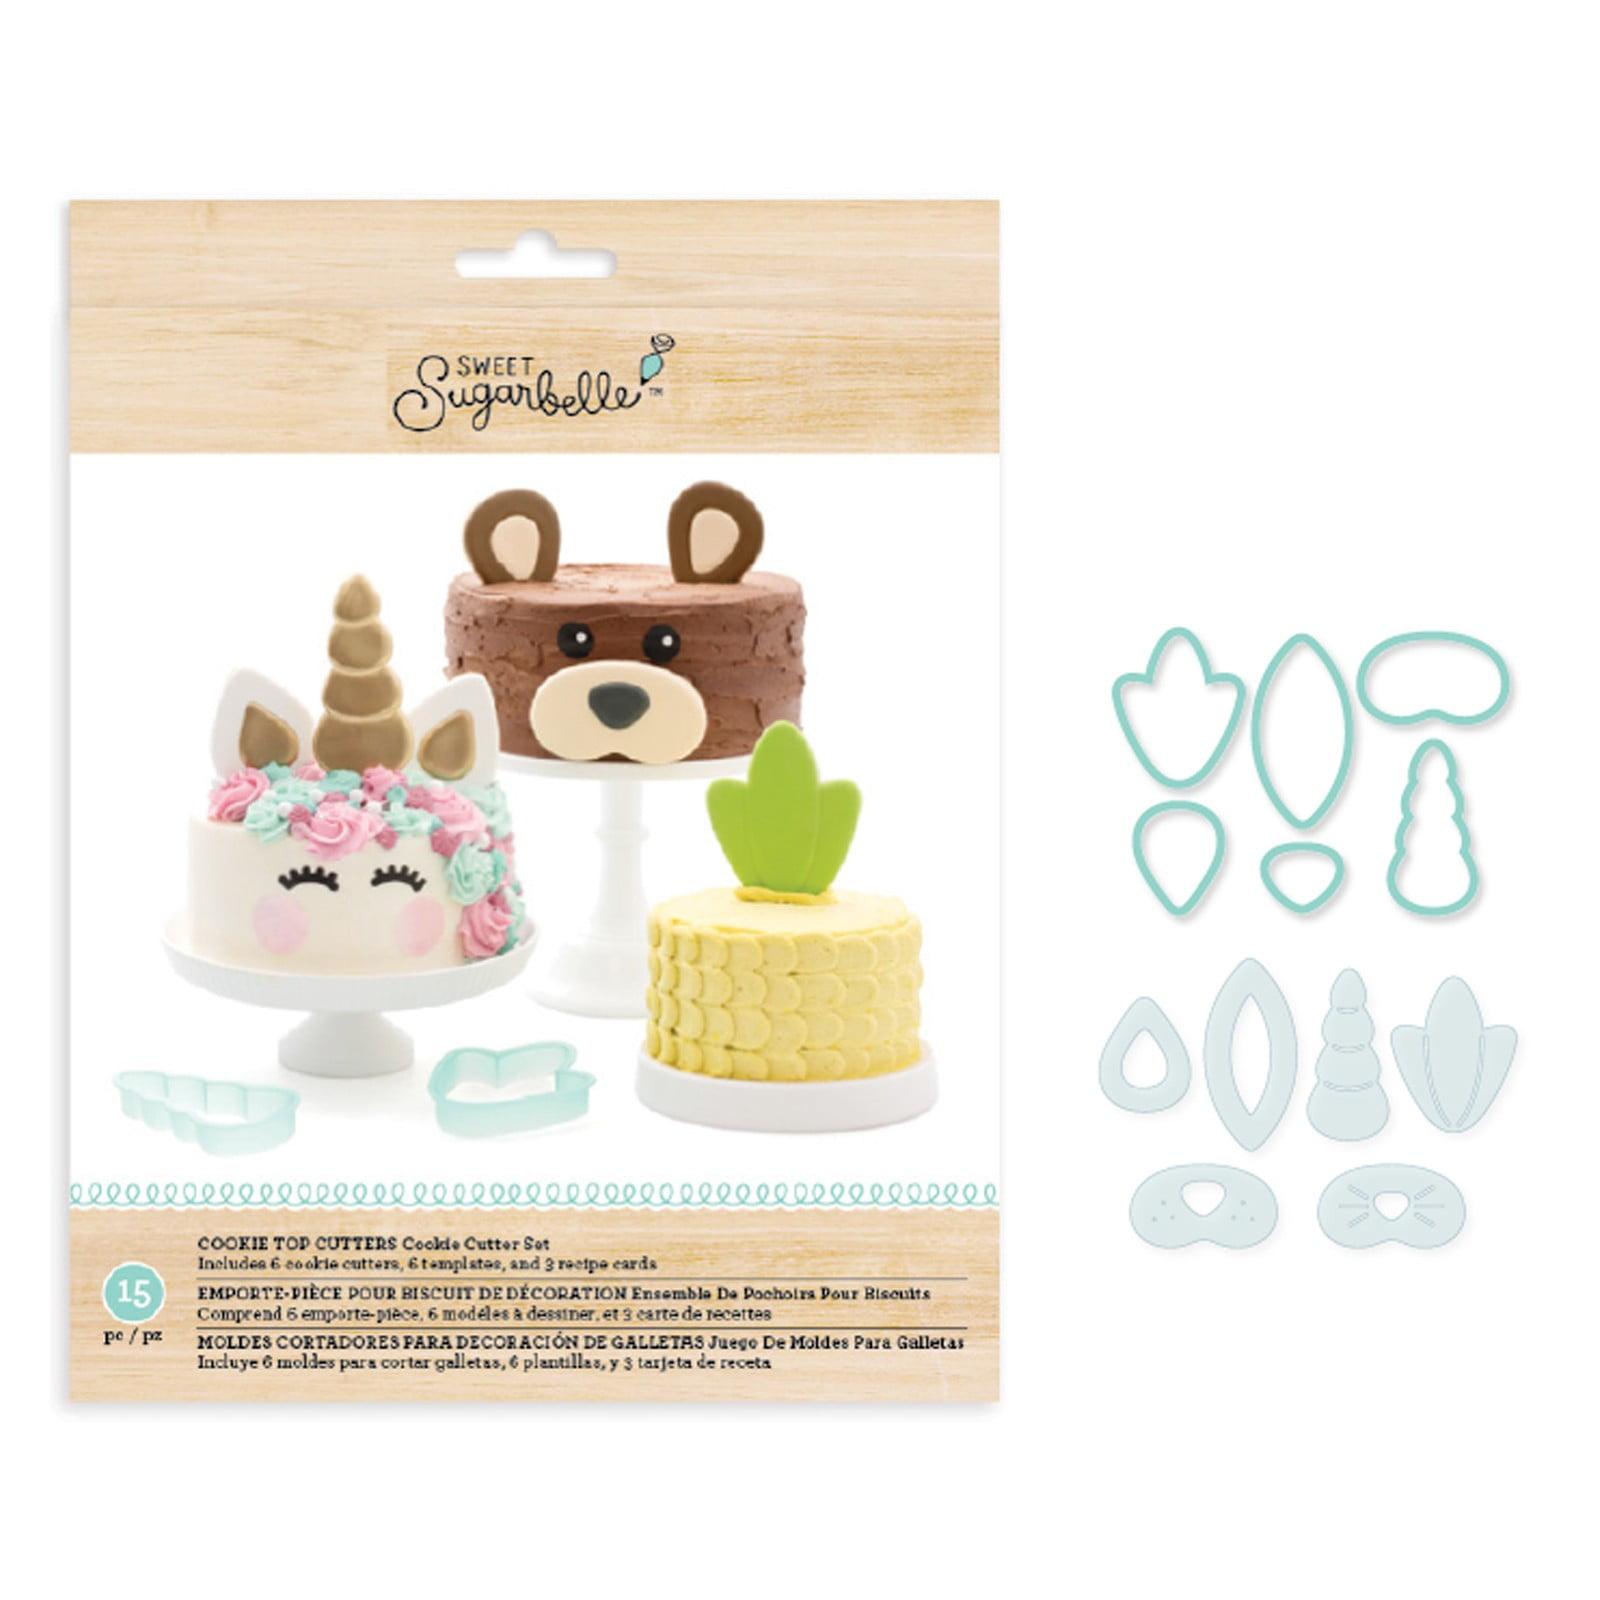 Terrific Sweet Sugarbelle Cookie Top Cookie Cutter Set Cake And Sugar Art Funny Birthday Cards Online Hendilapandamsfinfo